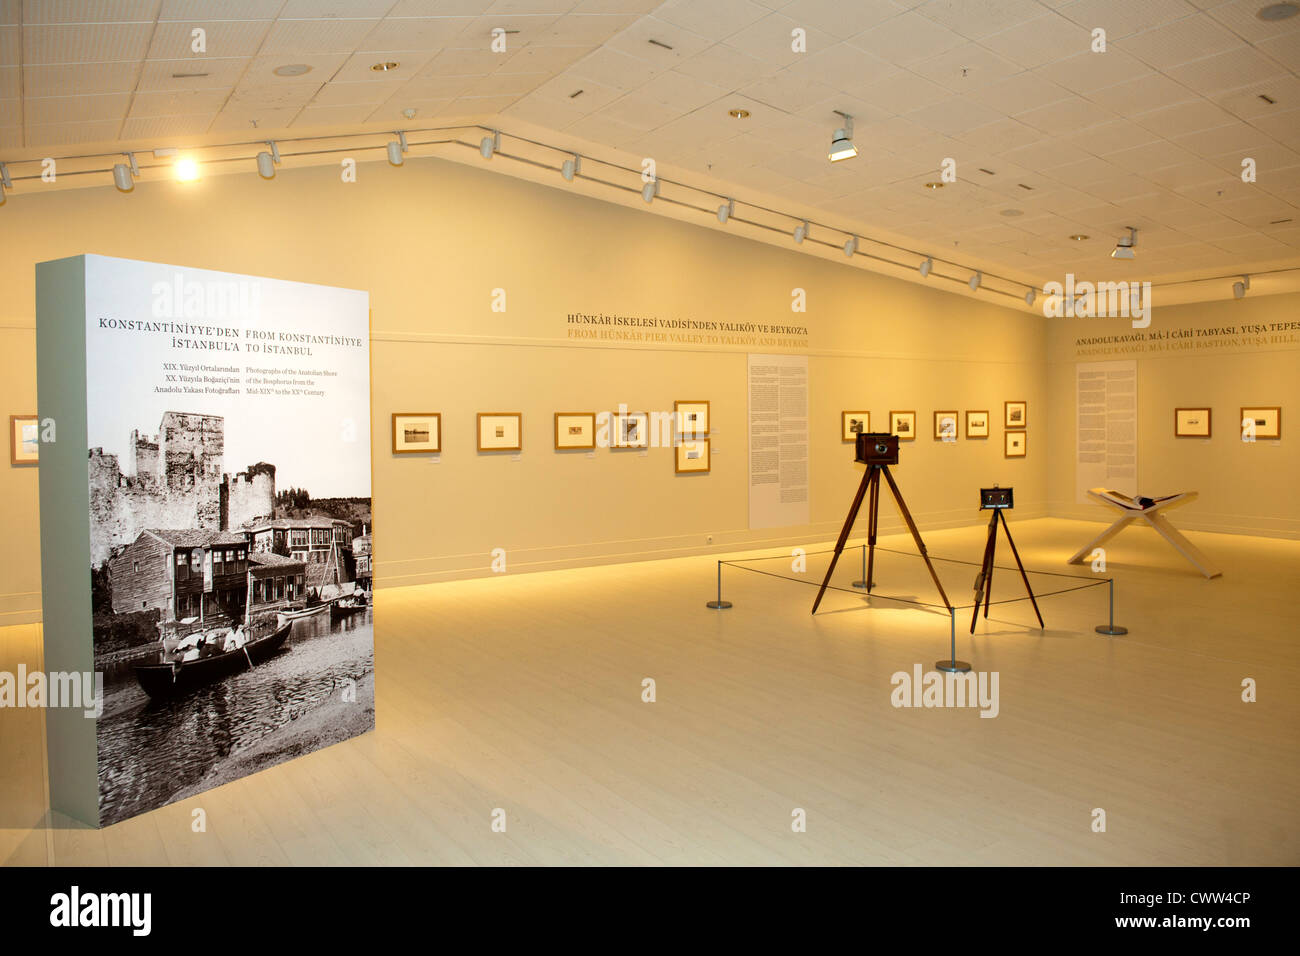 Türkei, Istanbul, Beyoglu, Tepabasi, das Pera-Museum ist ein Kunstmuseum. - Stock Image